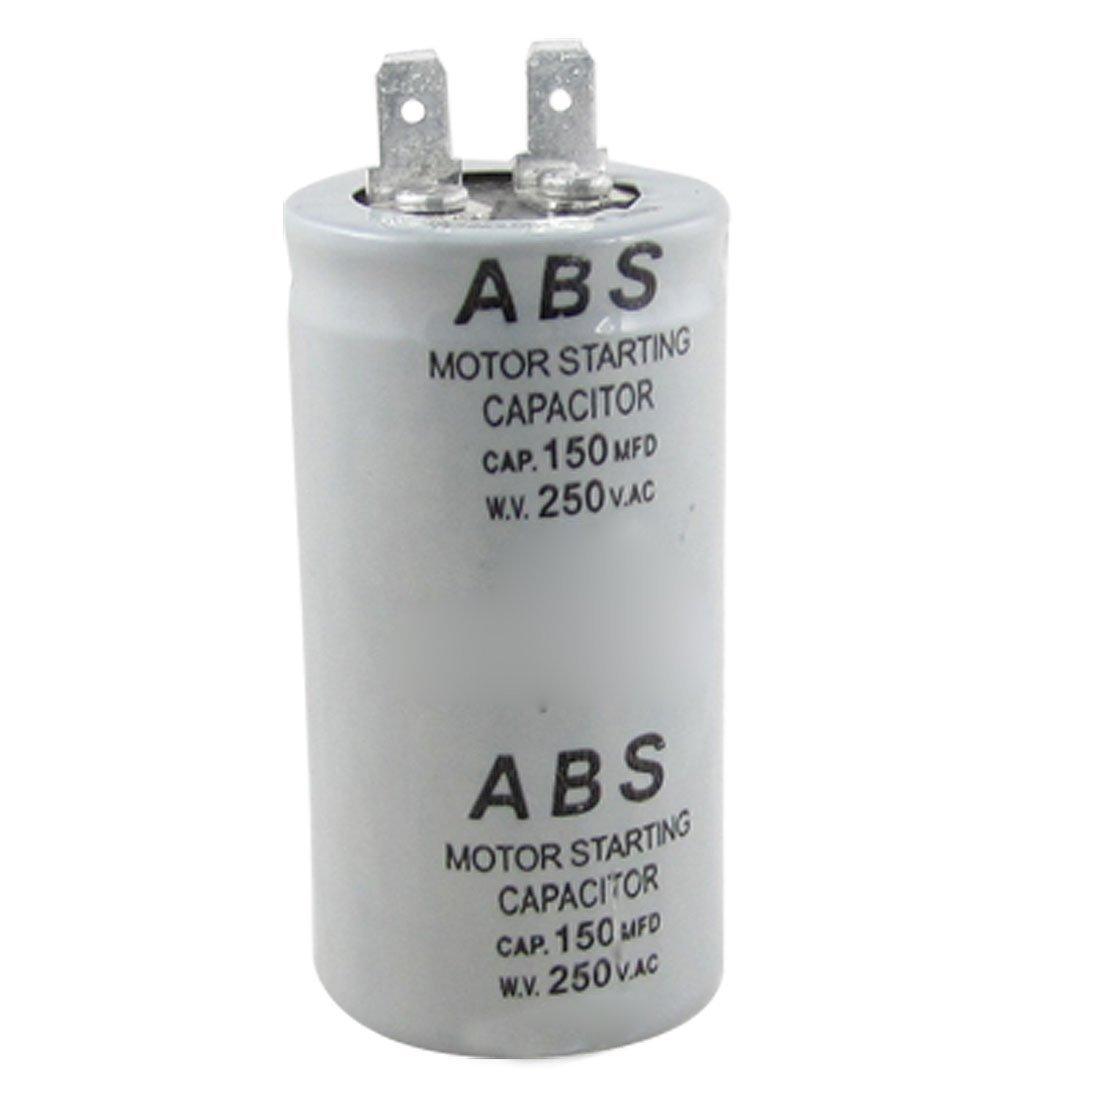 TOOGOO(R) ABS Serie 150MFD 150UF 250V AC Condensador de arranque del motor SHOMAGT19395